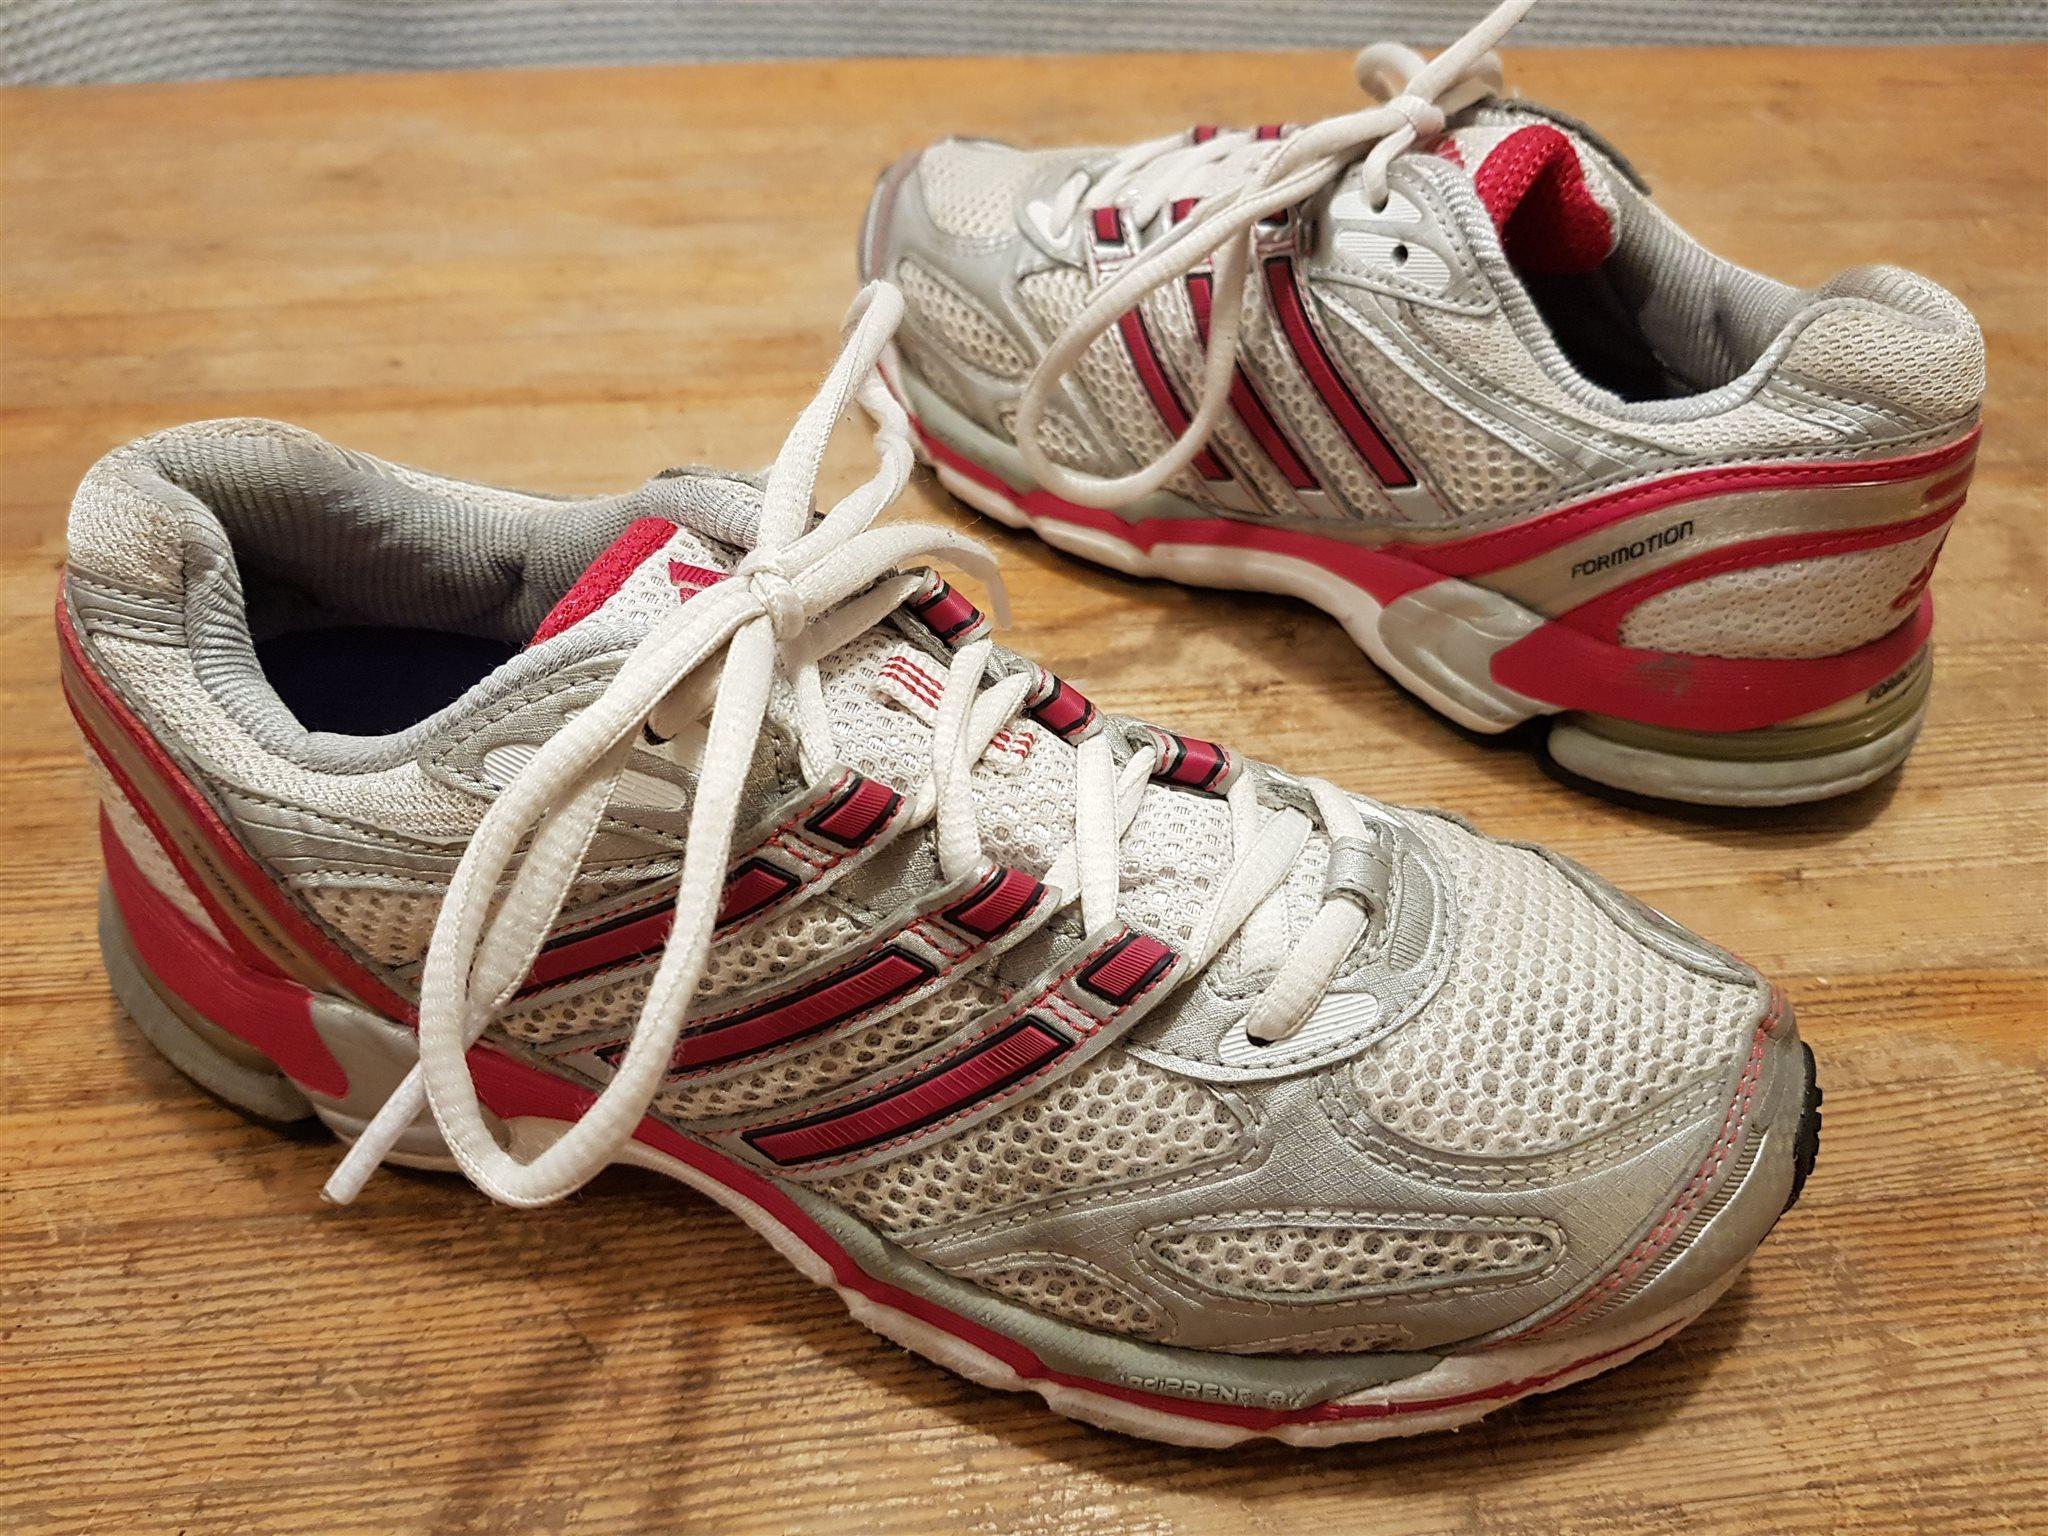 release date: f448c f64e6 Löparskor sneakers Adidas Formotion adiPrene adiWear str 38 2 3 i gott skick  ...